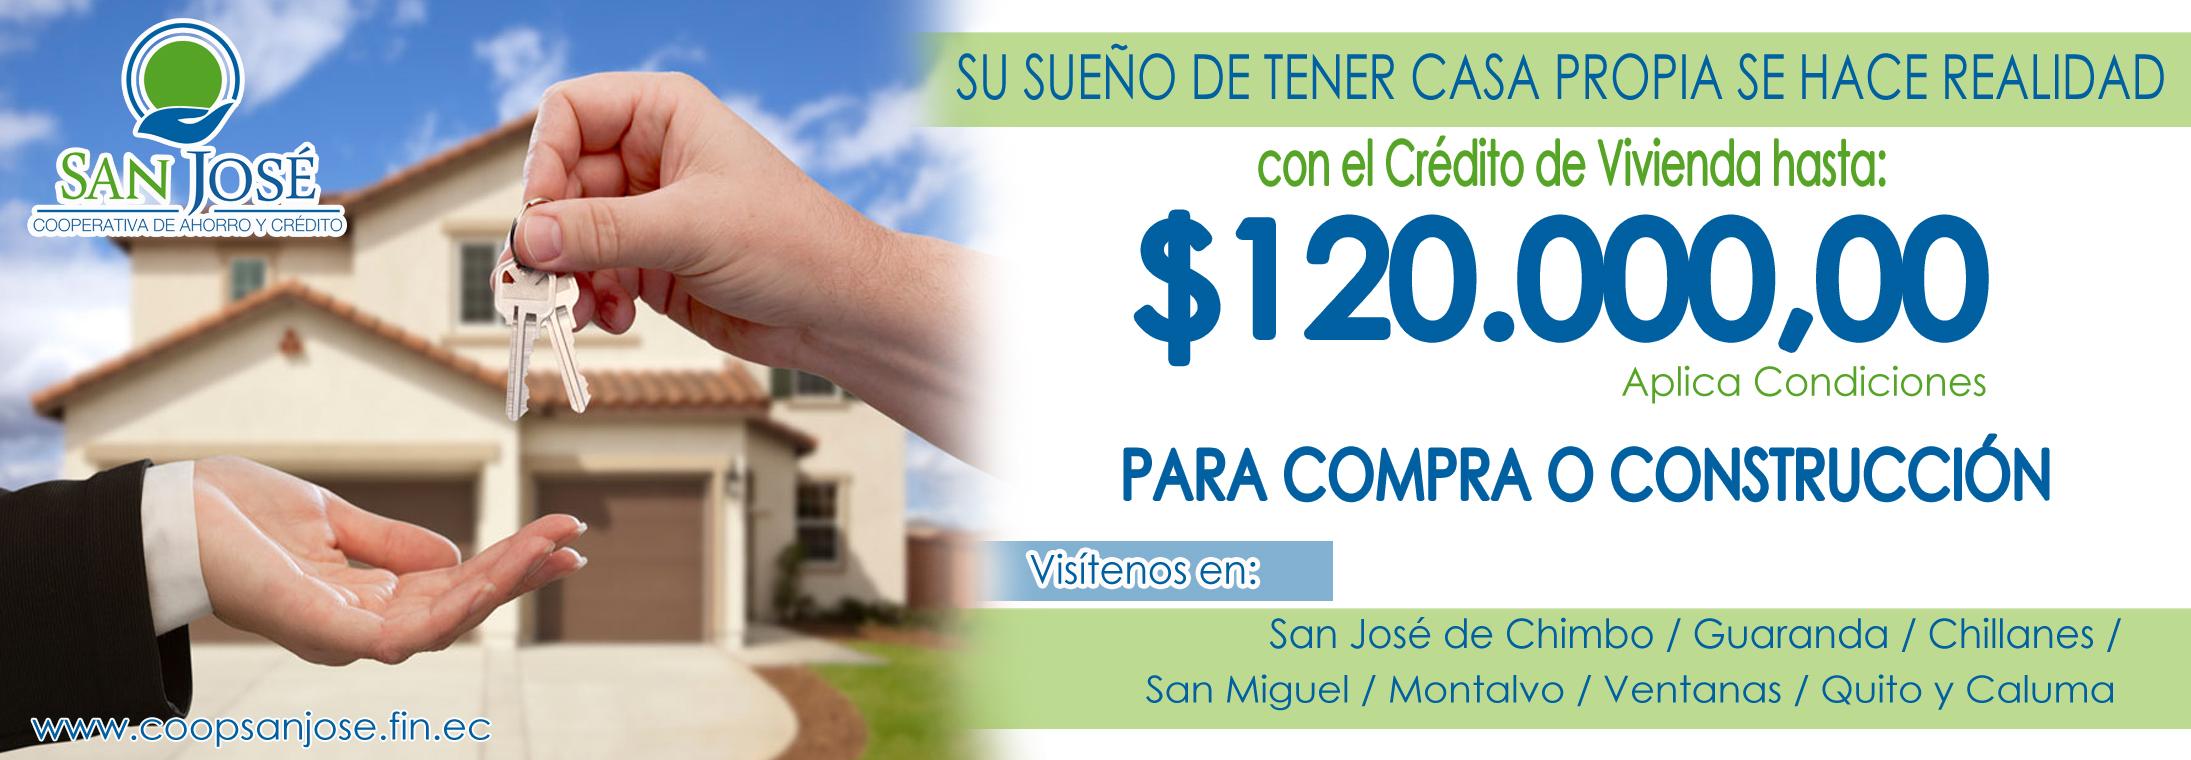 Credito-vivienda3web